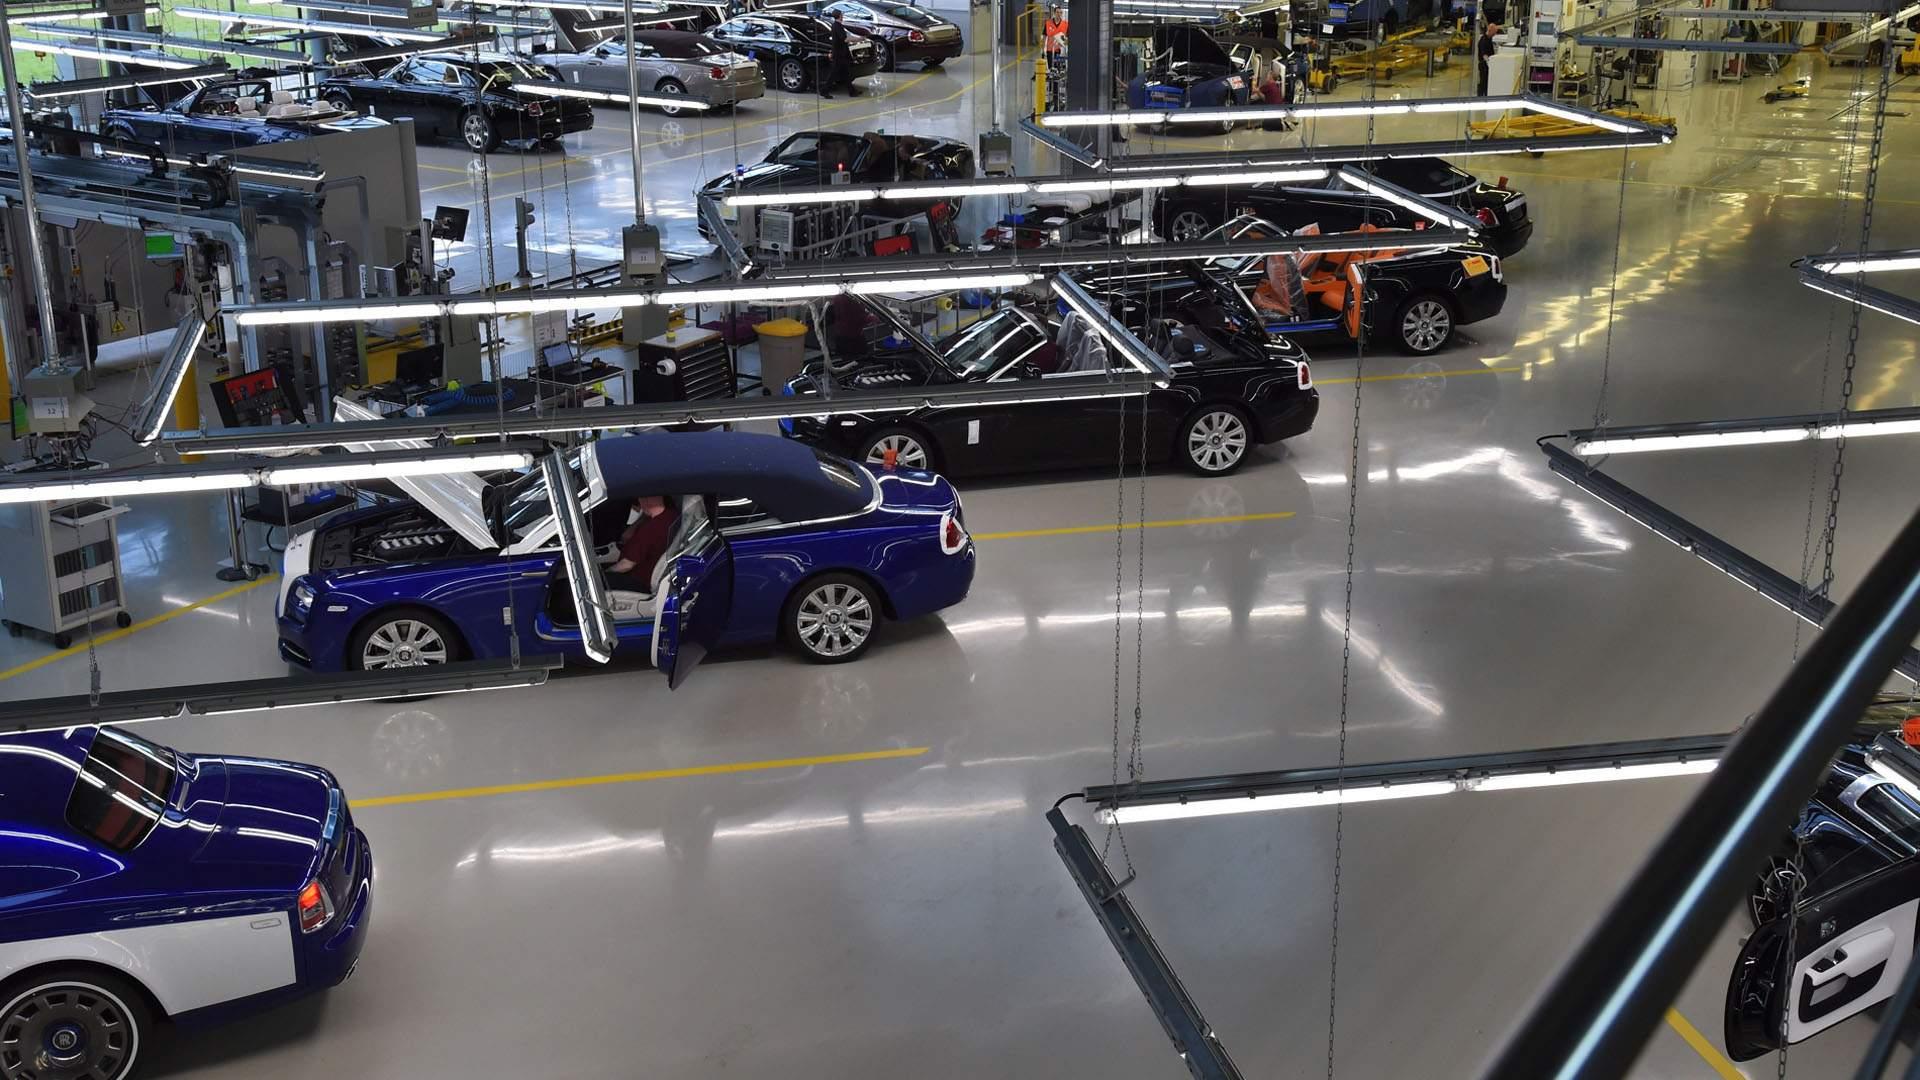 Fabrica De Rolls Royce